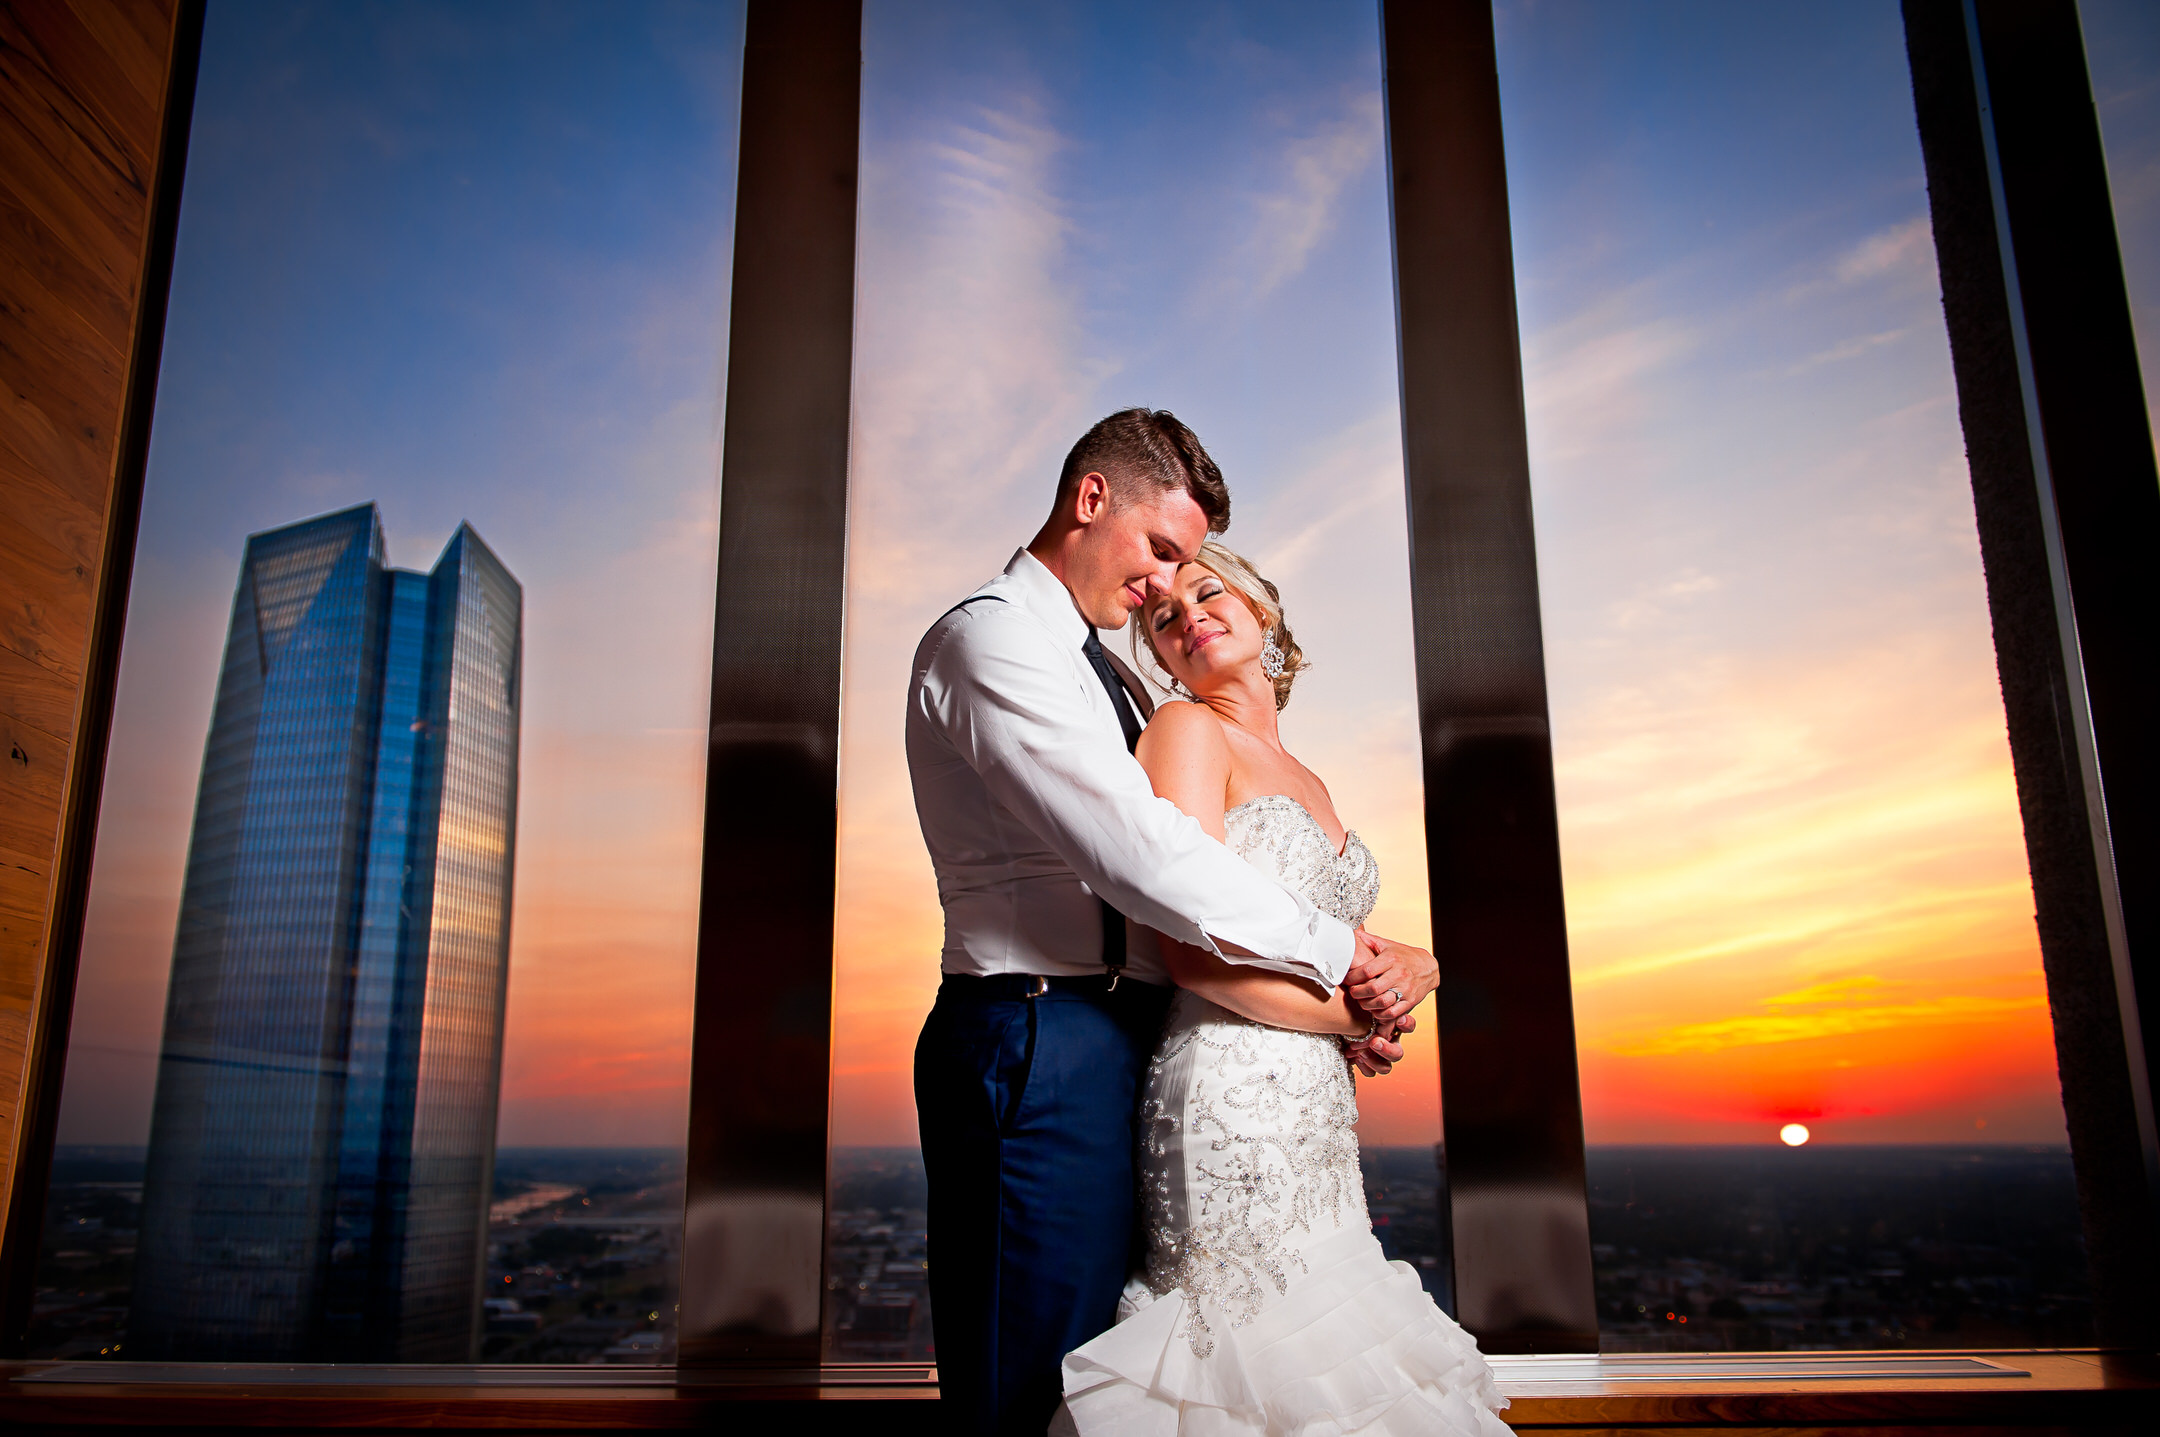 Oklahoma-City-Wedding-Photography-Travis-and-Haley-G